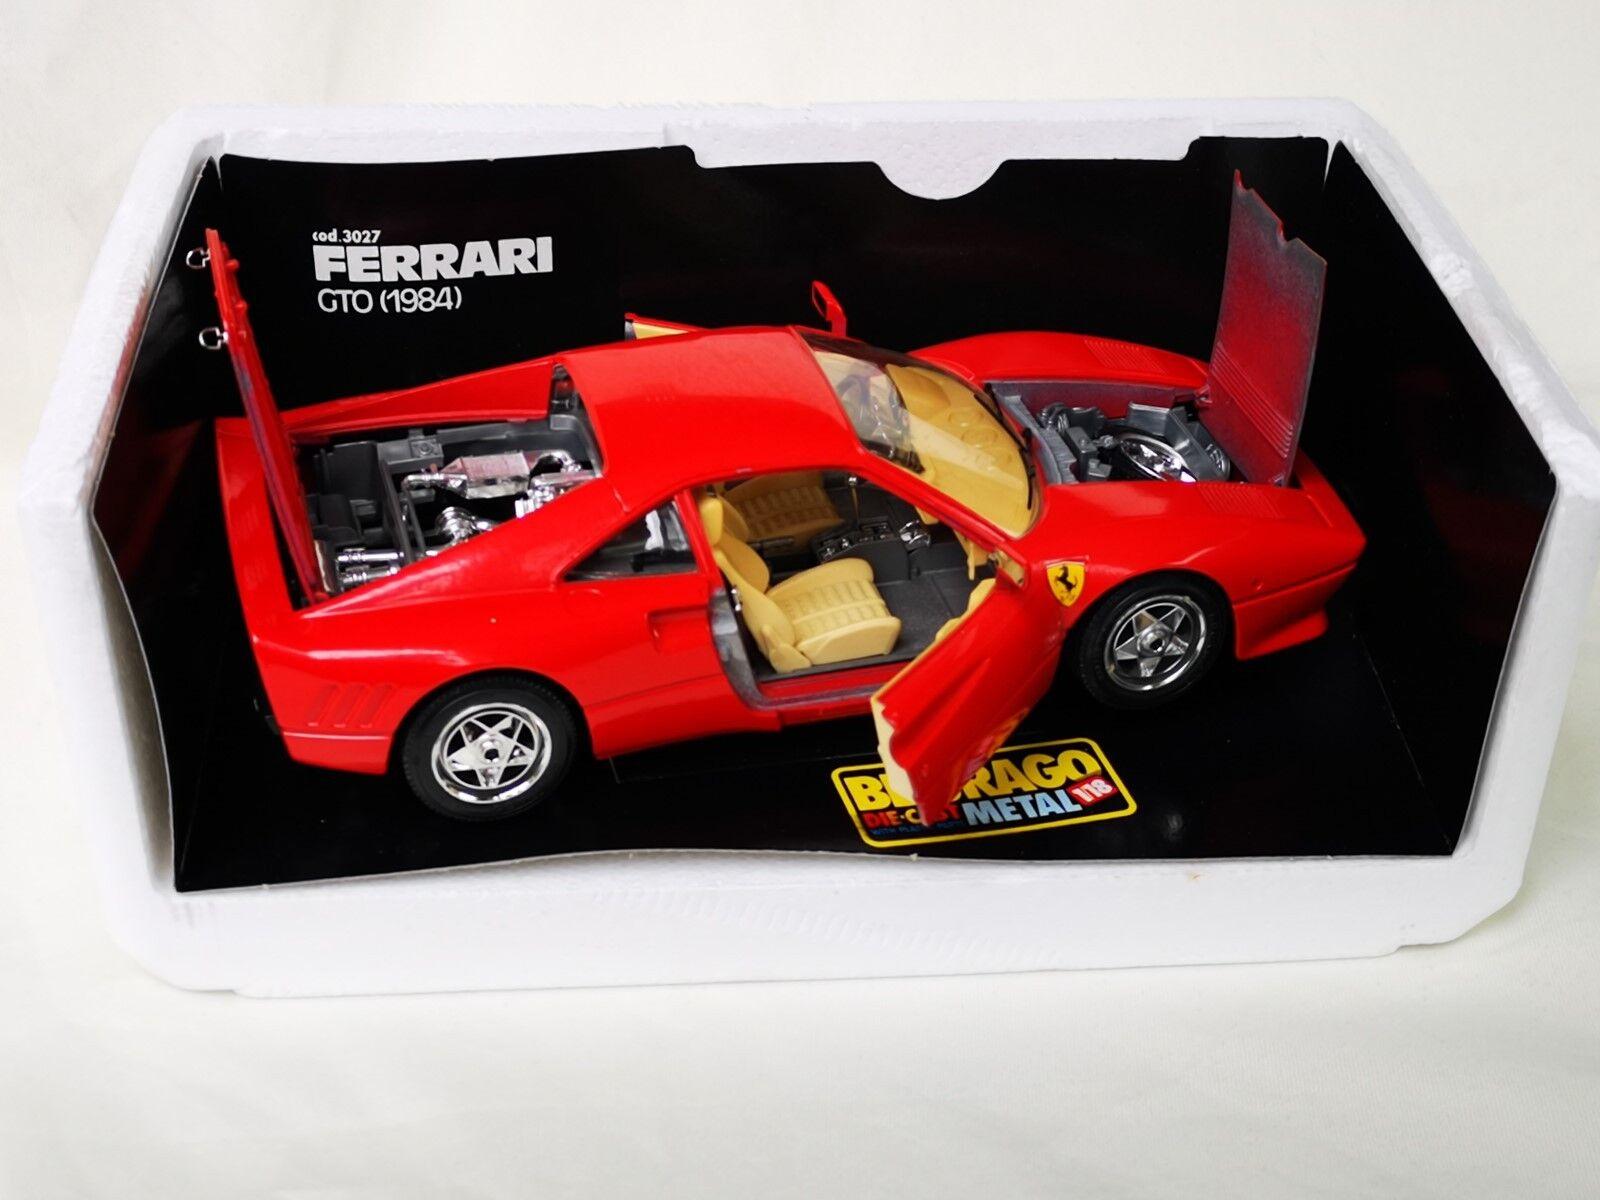 Bburago Ferrari GTO (1984) Die Cast Metal nr 3027 1 18 lådaed